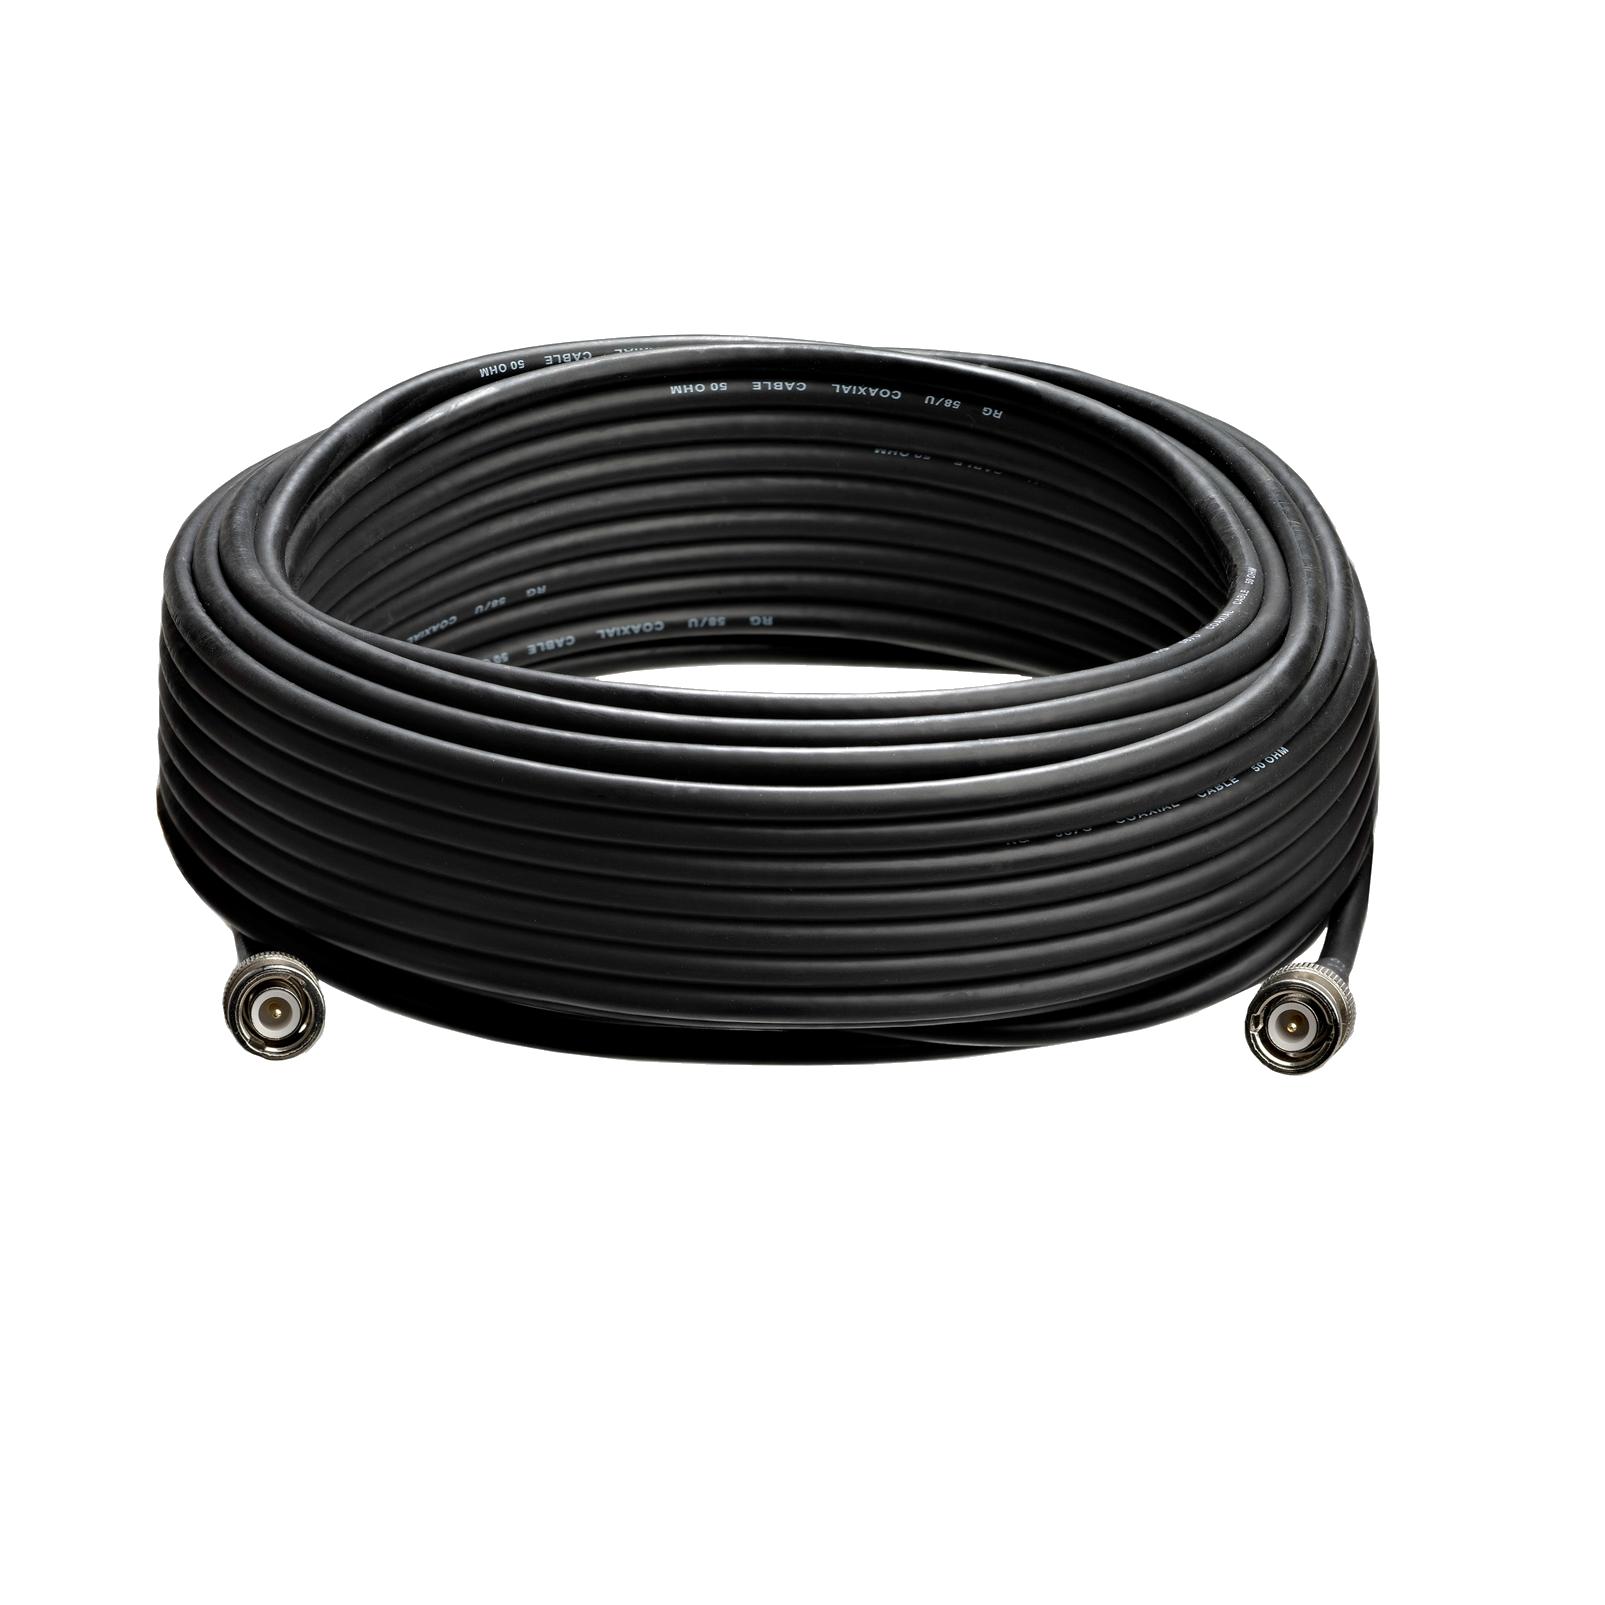 MKA20 - Black - Antenna cable - 20m - Hero